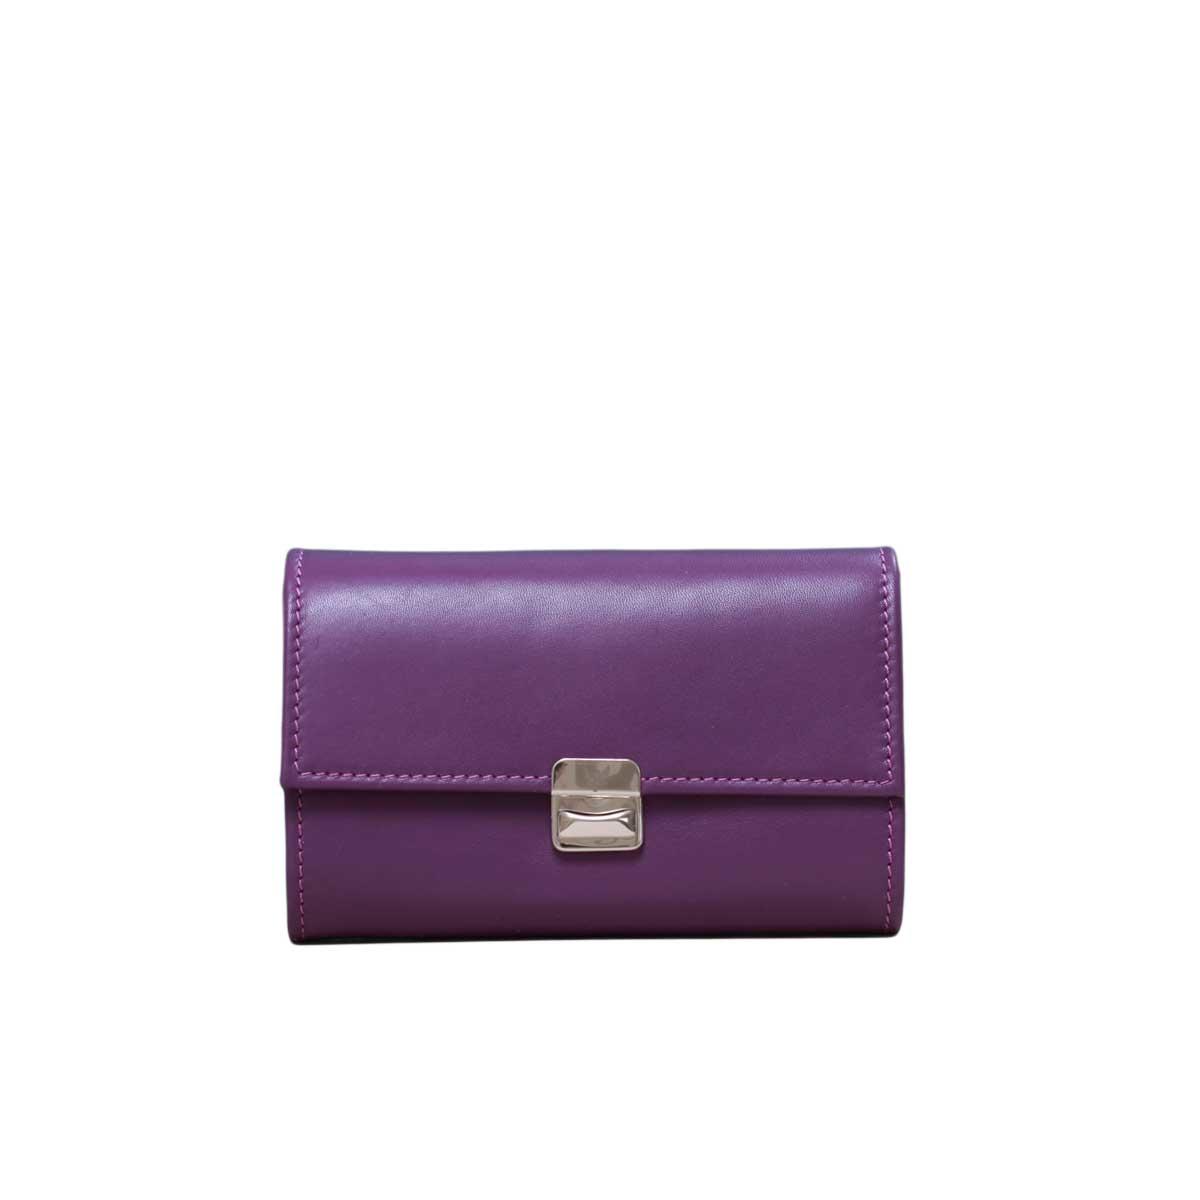 ultra violet leder geldbeutel kaufen